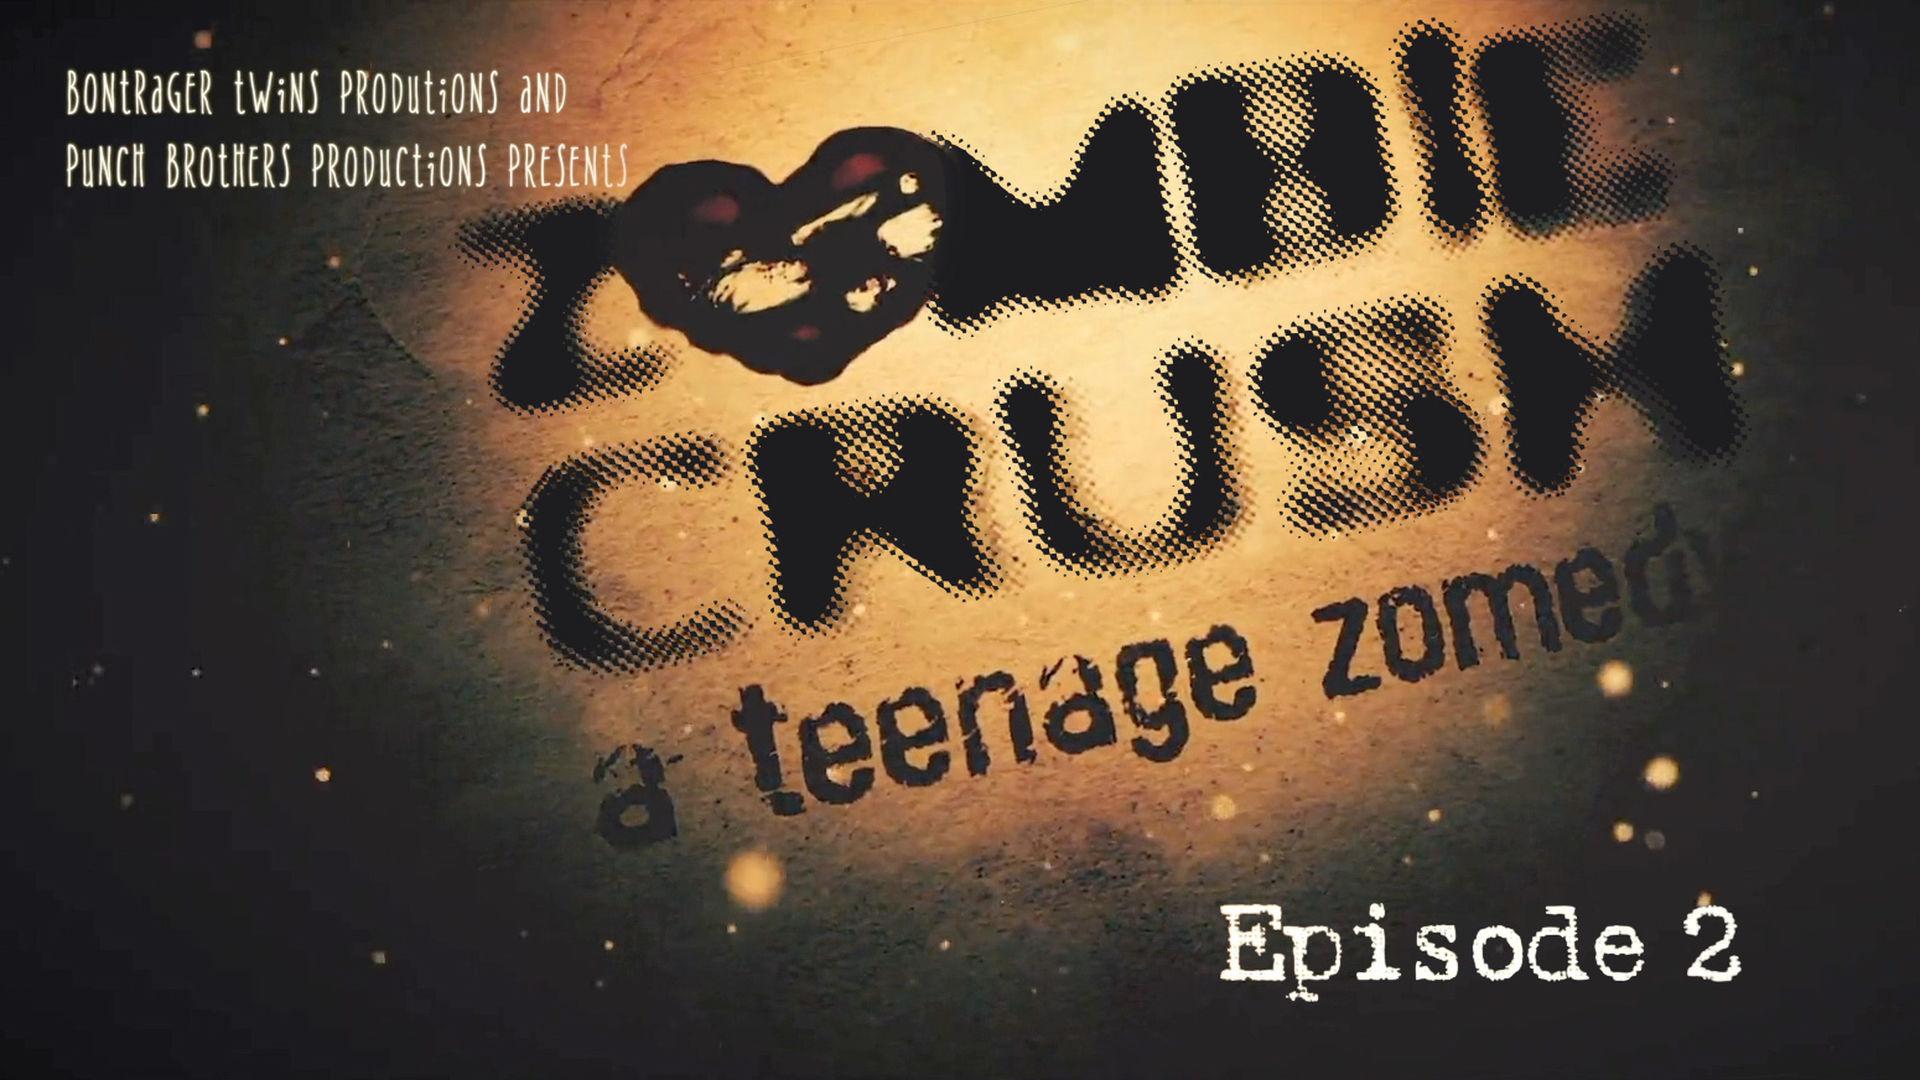 Zombie Crush - Ep2 - A Teenage Zomedy